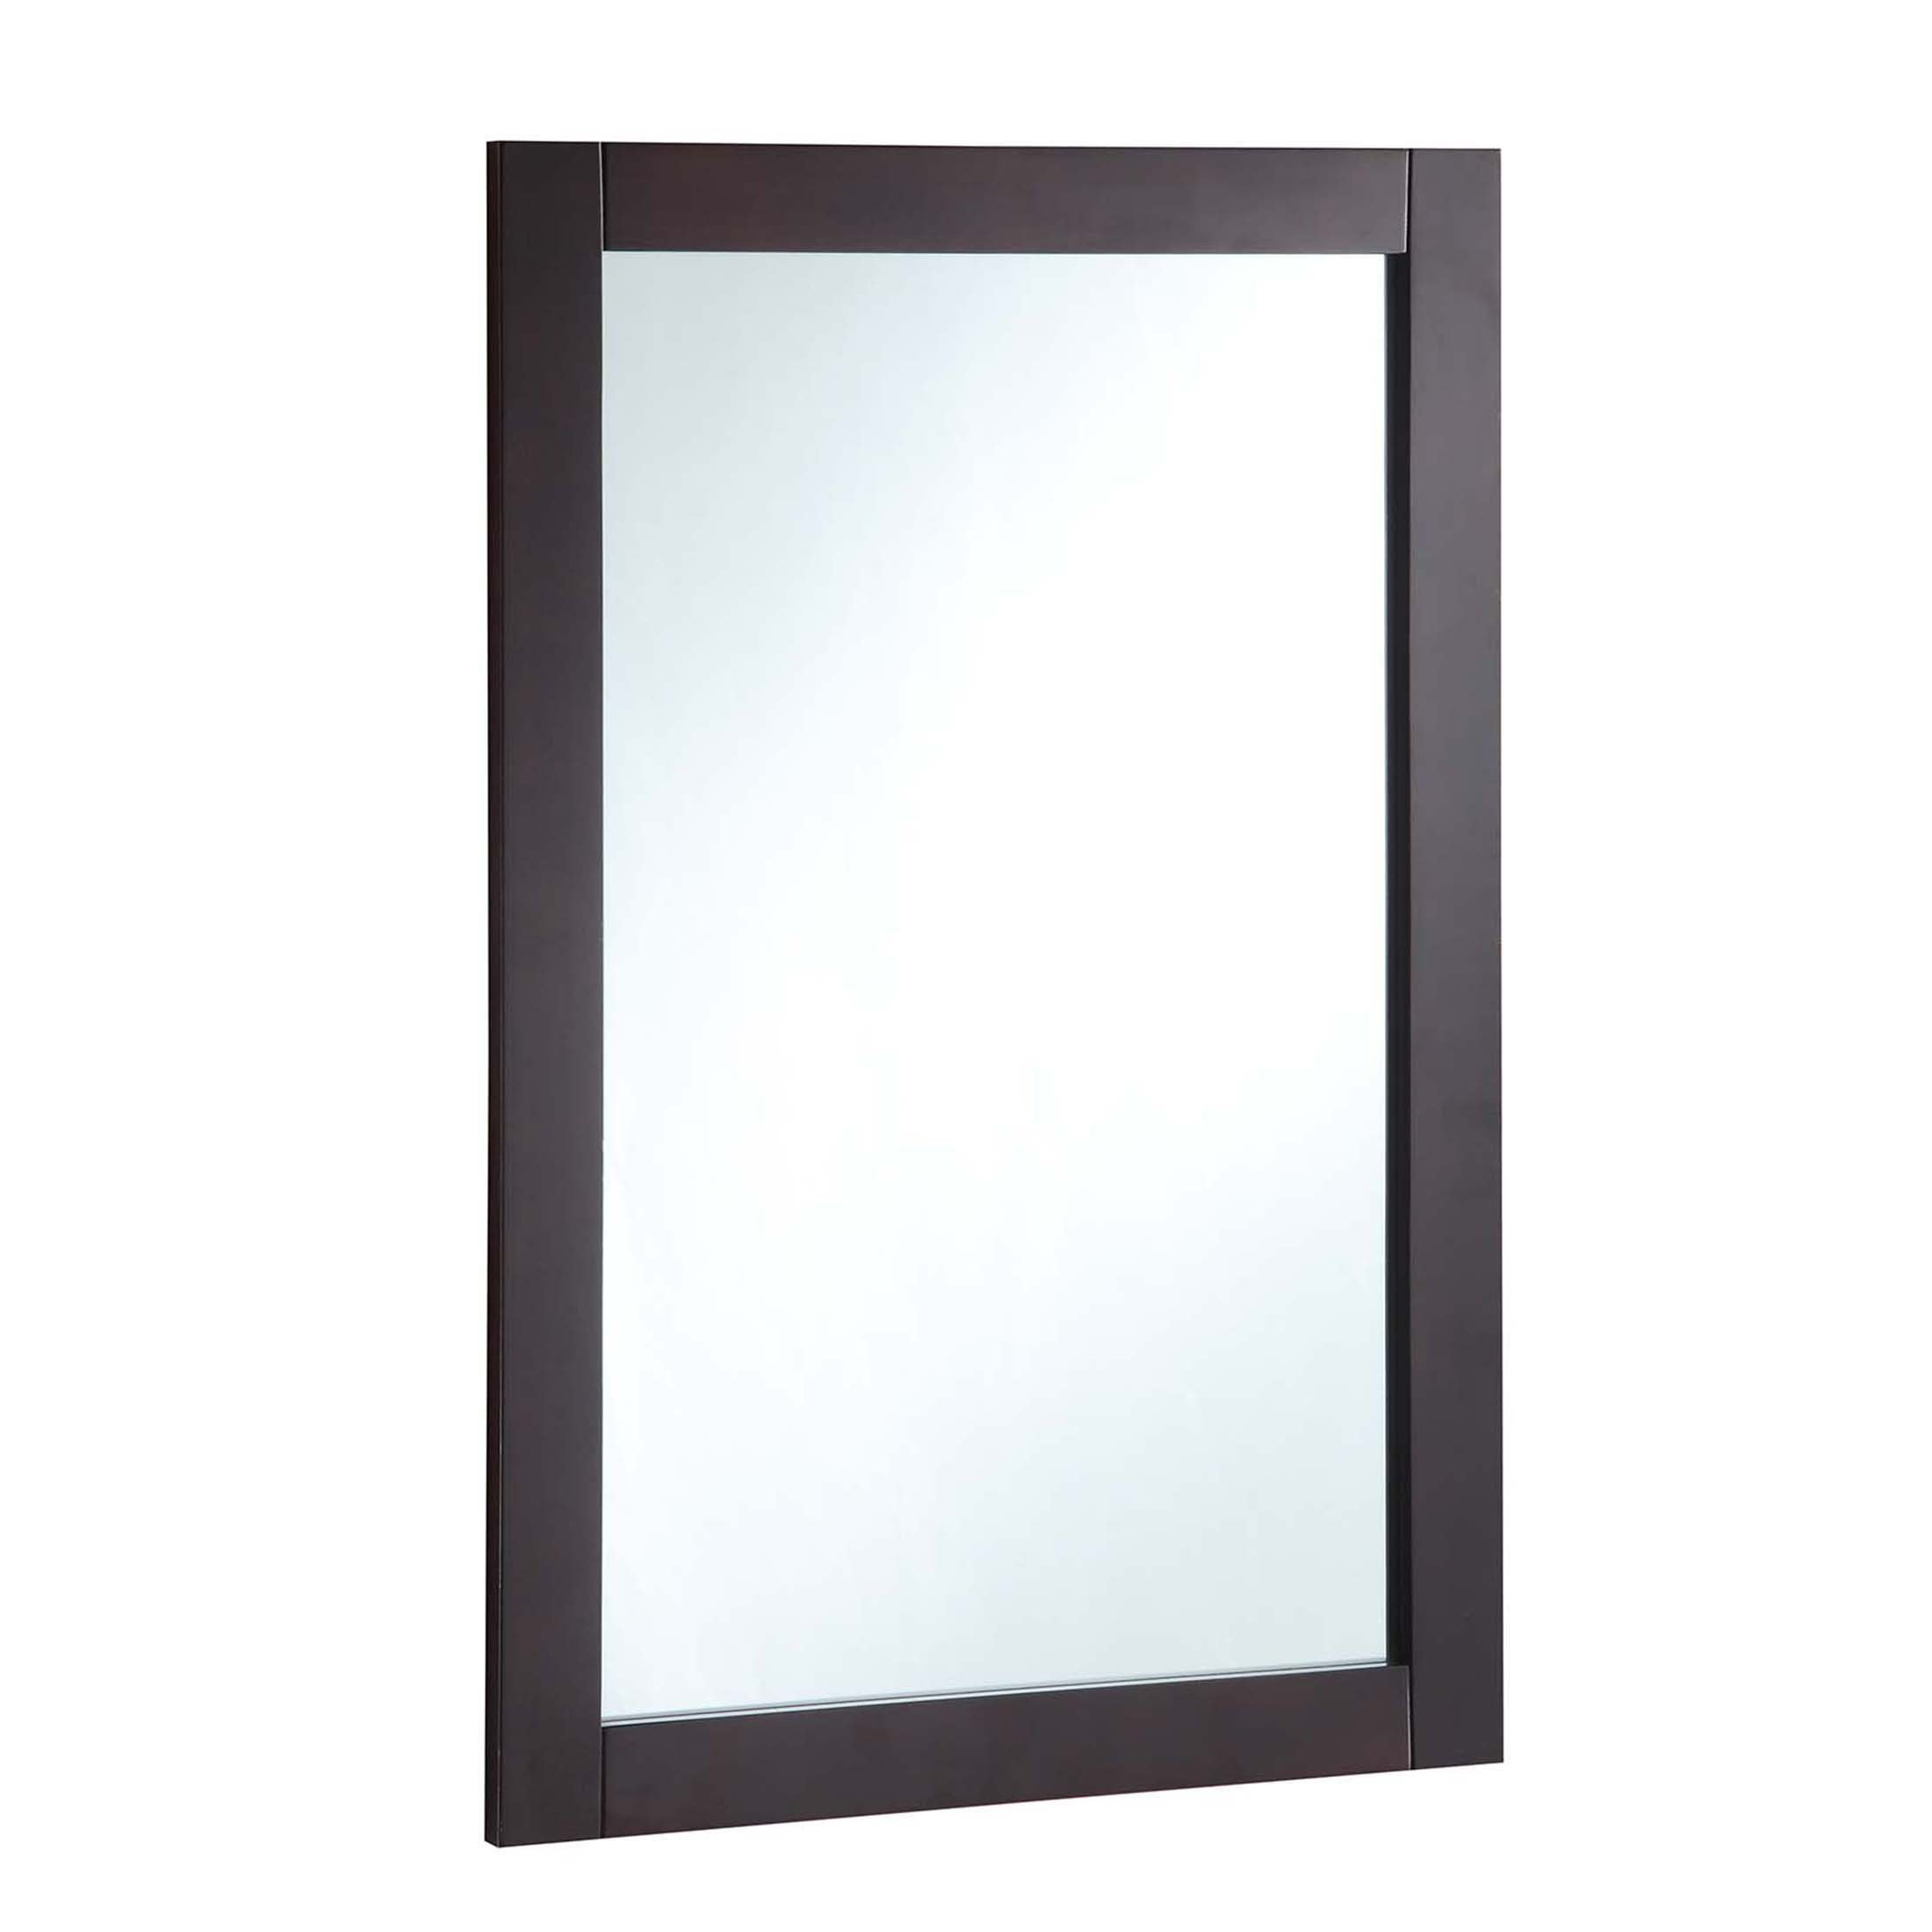 Design House 547075 20-Inch By 30-Inch Vanity Mirror, Espresso,